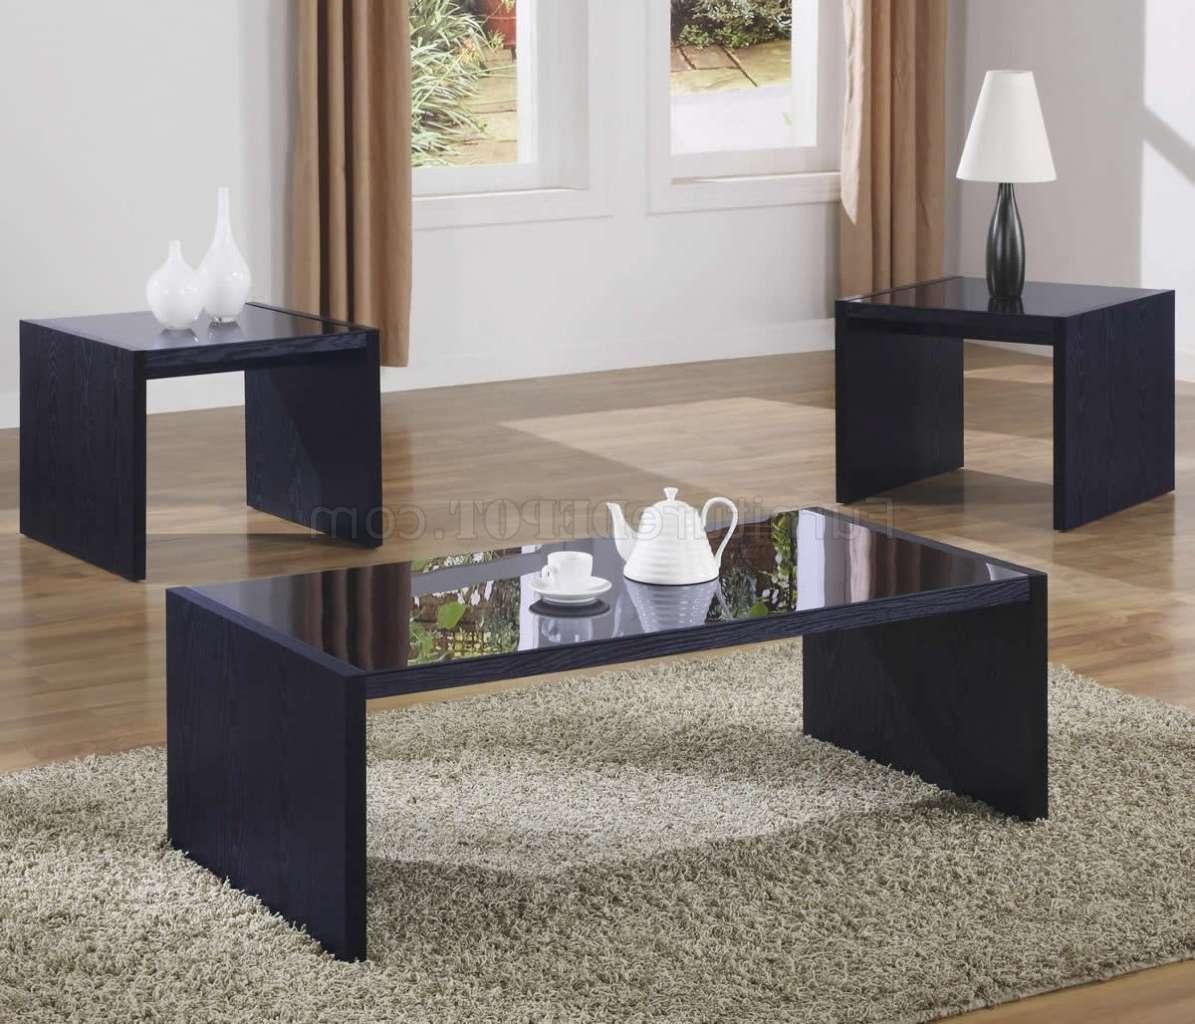 Black Modern 3pc Coffee Table Set W/black Glass Tops Pertaining To Latest Black Glass Coffee Tables (View 18 of 20)